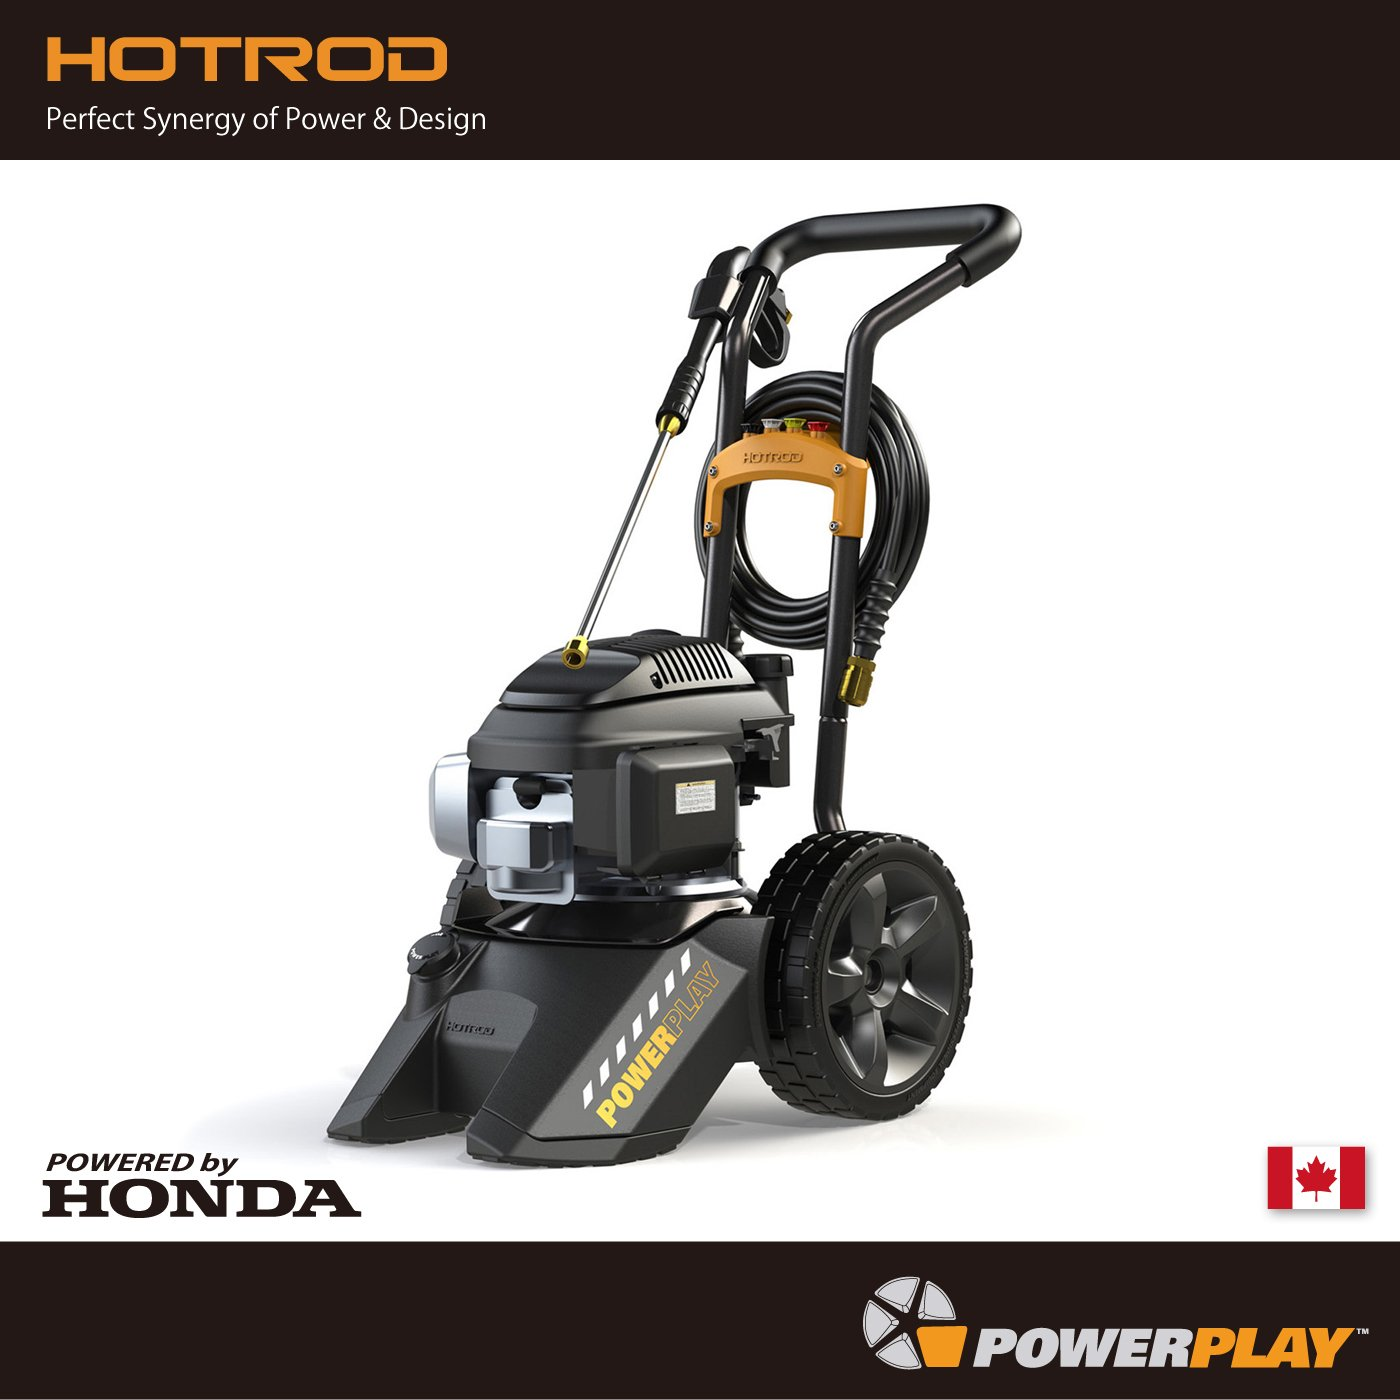 Powerplayエンジン高圧洗浄機[HOTROD]HONDA GCV160 (パワープレイ) B00VHM8AUM